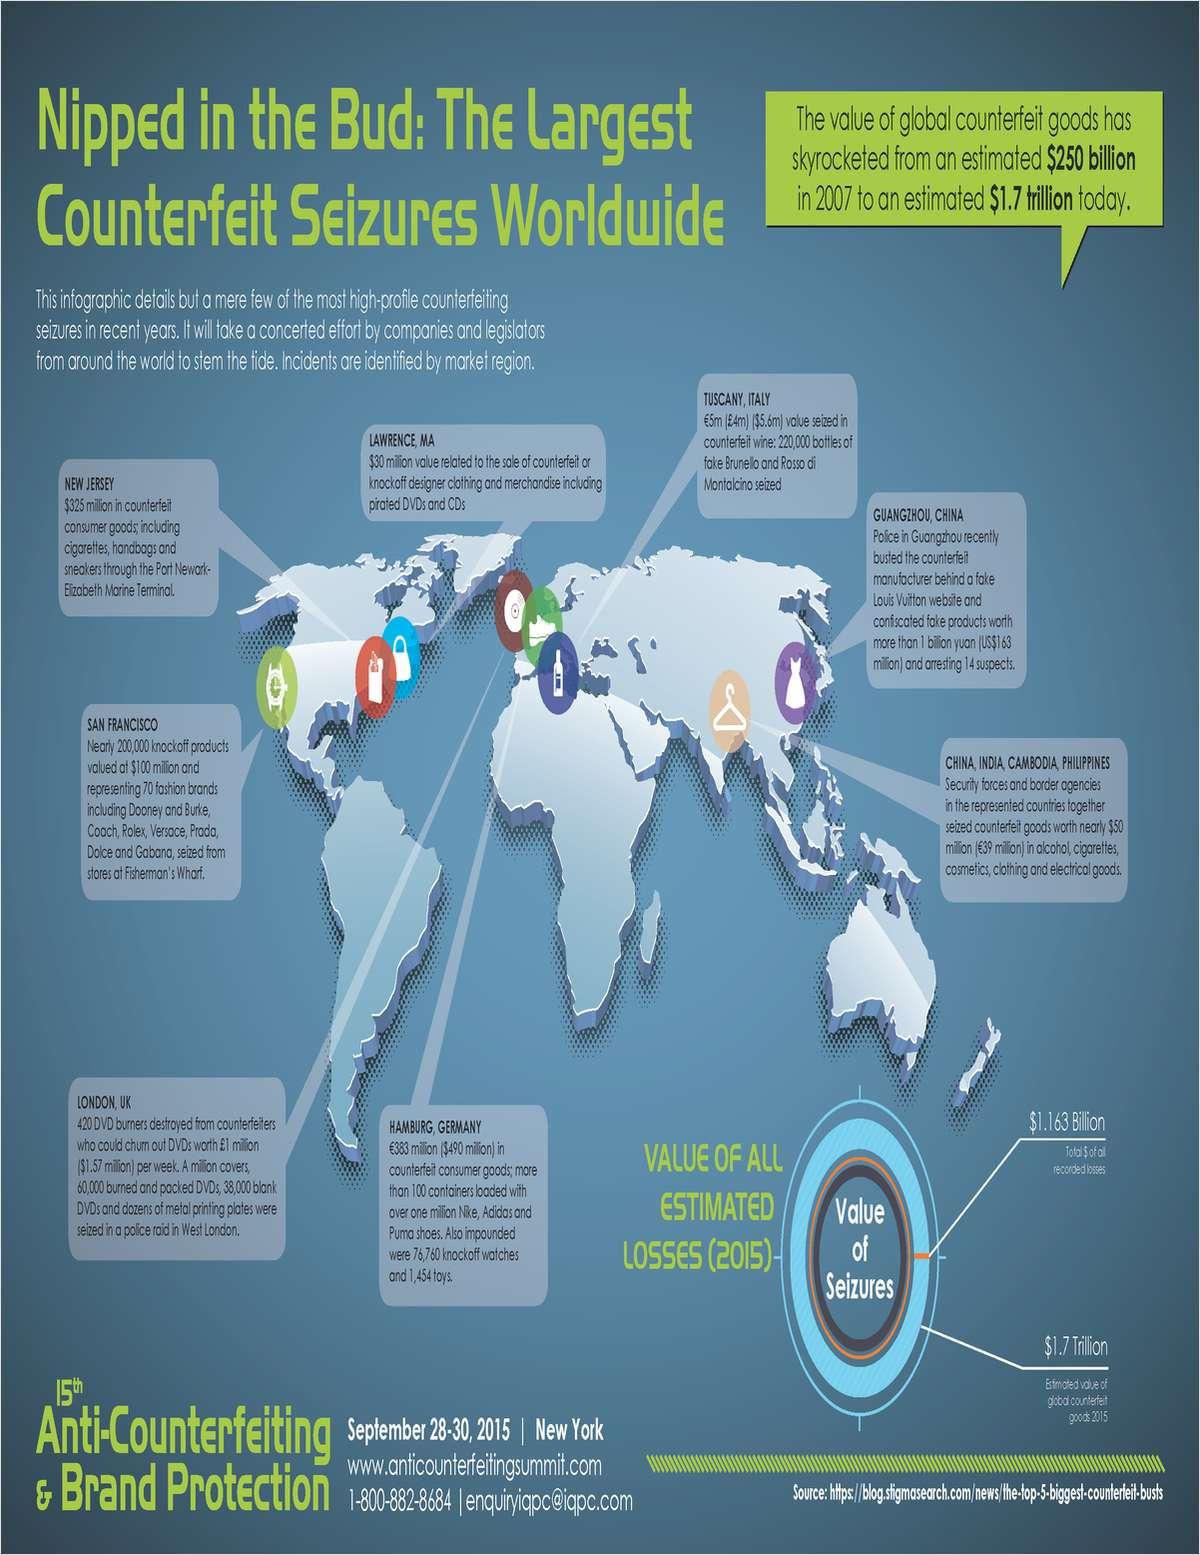 The Largest Counterfeit Seizures Worldwide